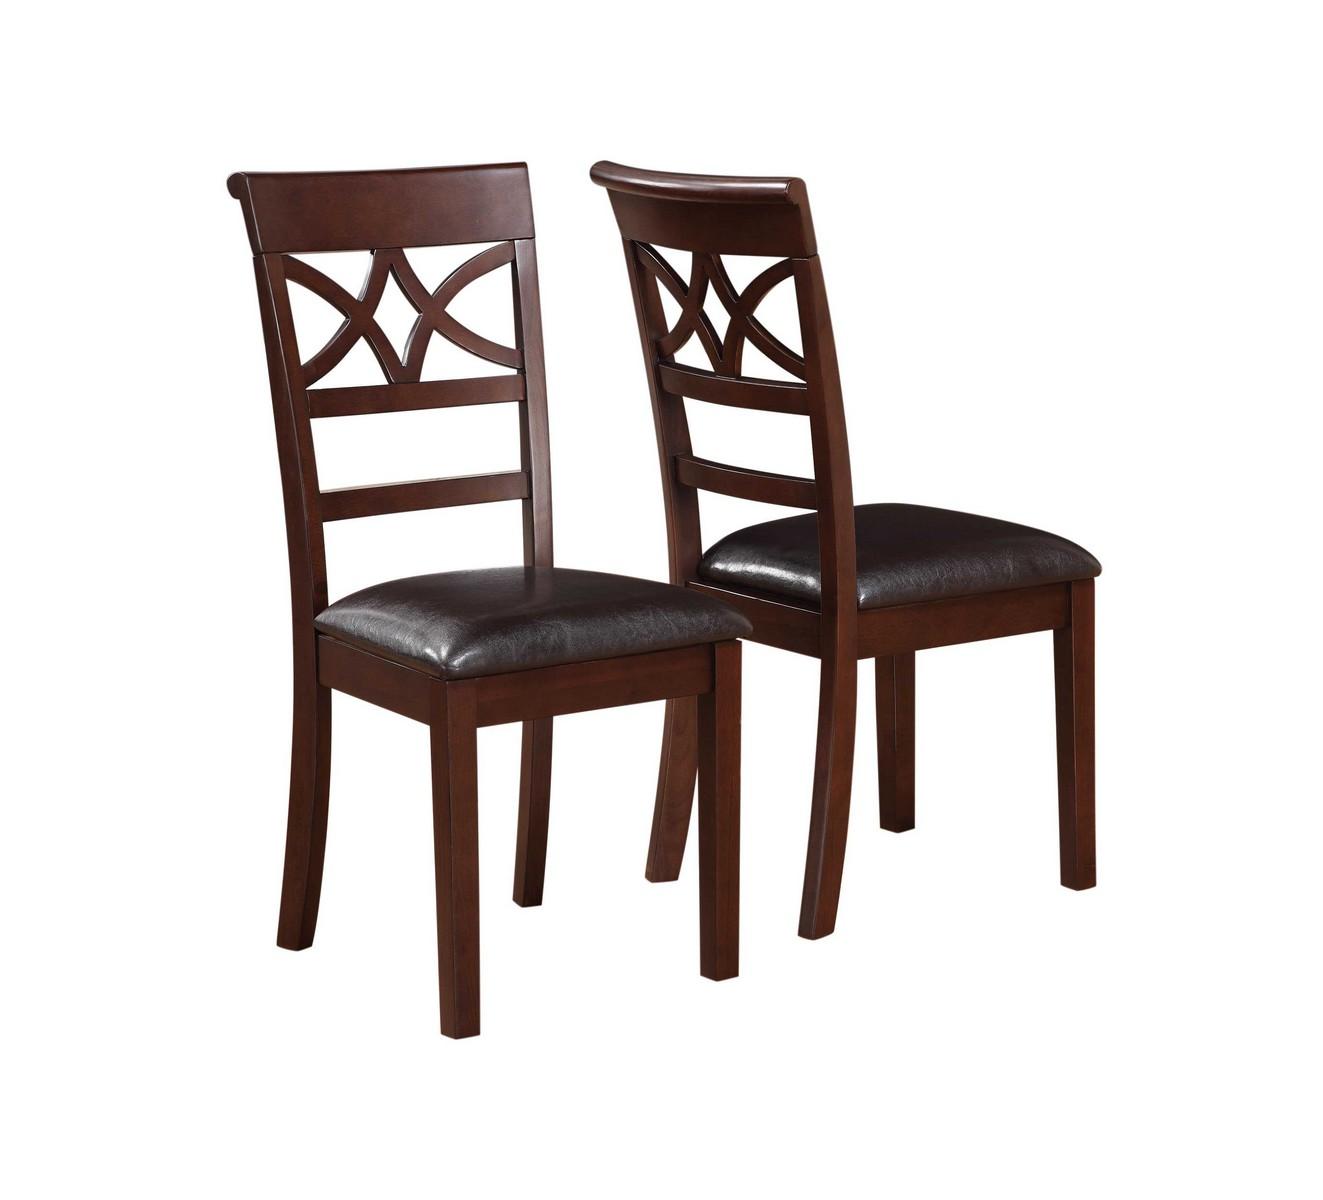 Coaster Dunham Side Chair - Brown Red/Dark Brown Leatherette